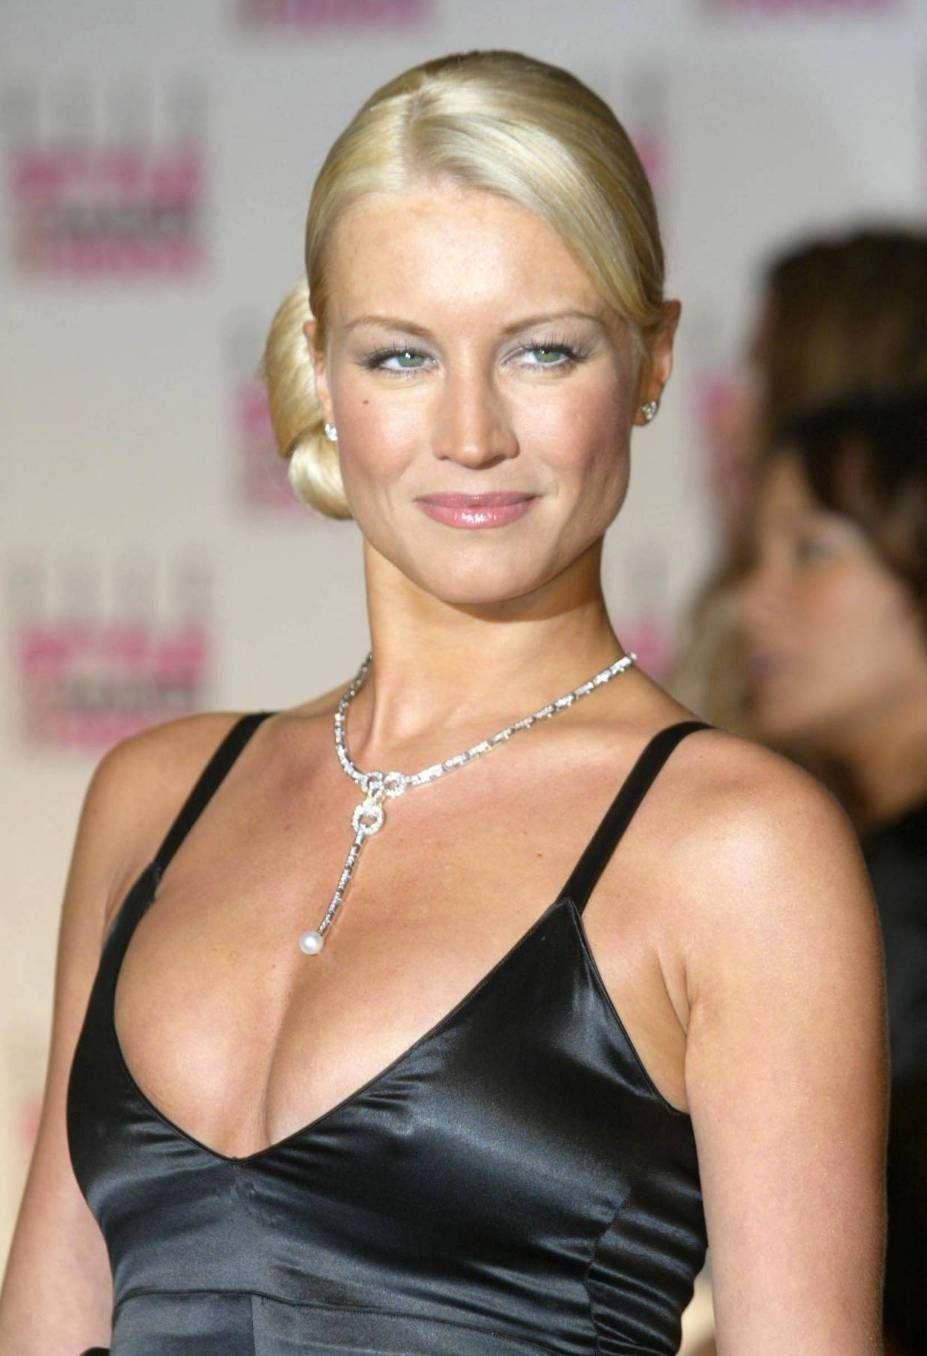 Celebrity Denise van Outen nude (56 foto and video), Sexy, Bikini, Selfie, in bikini 2020